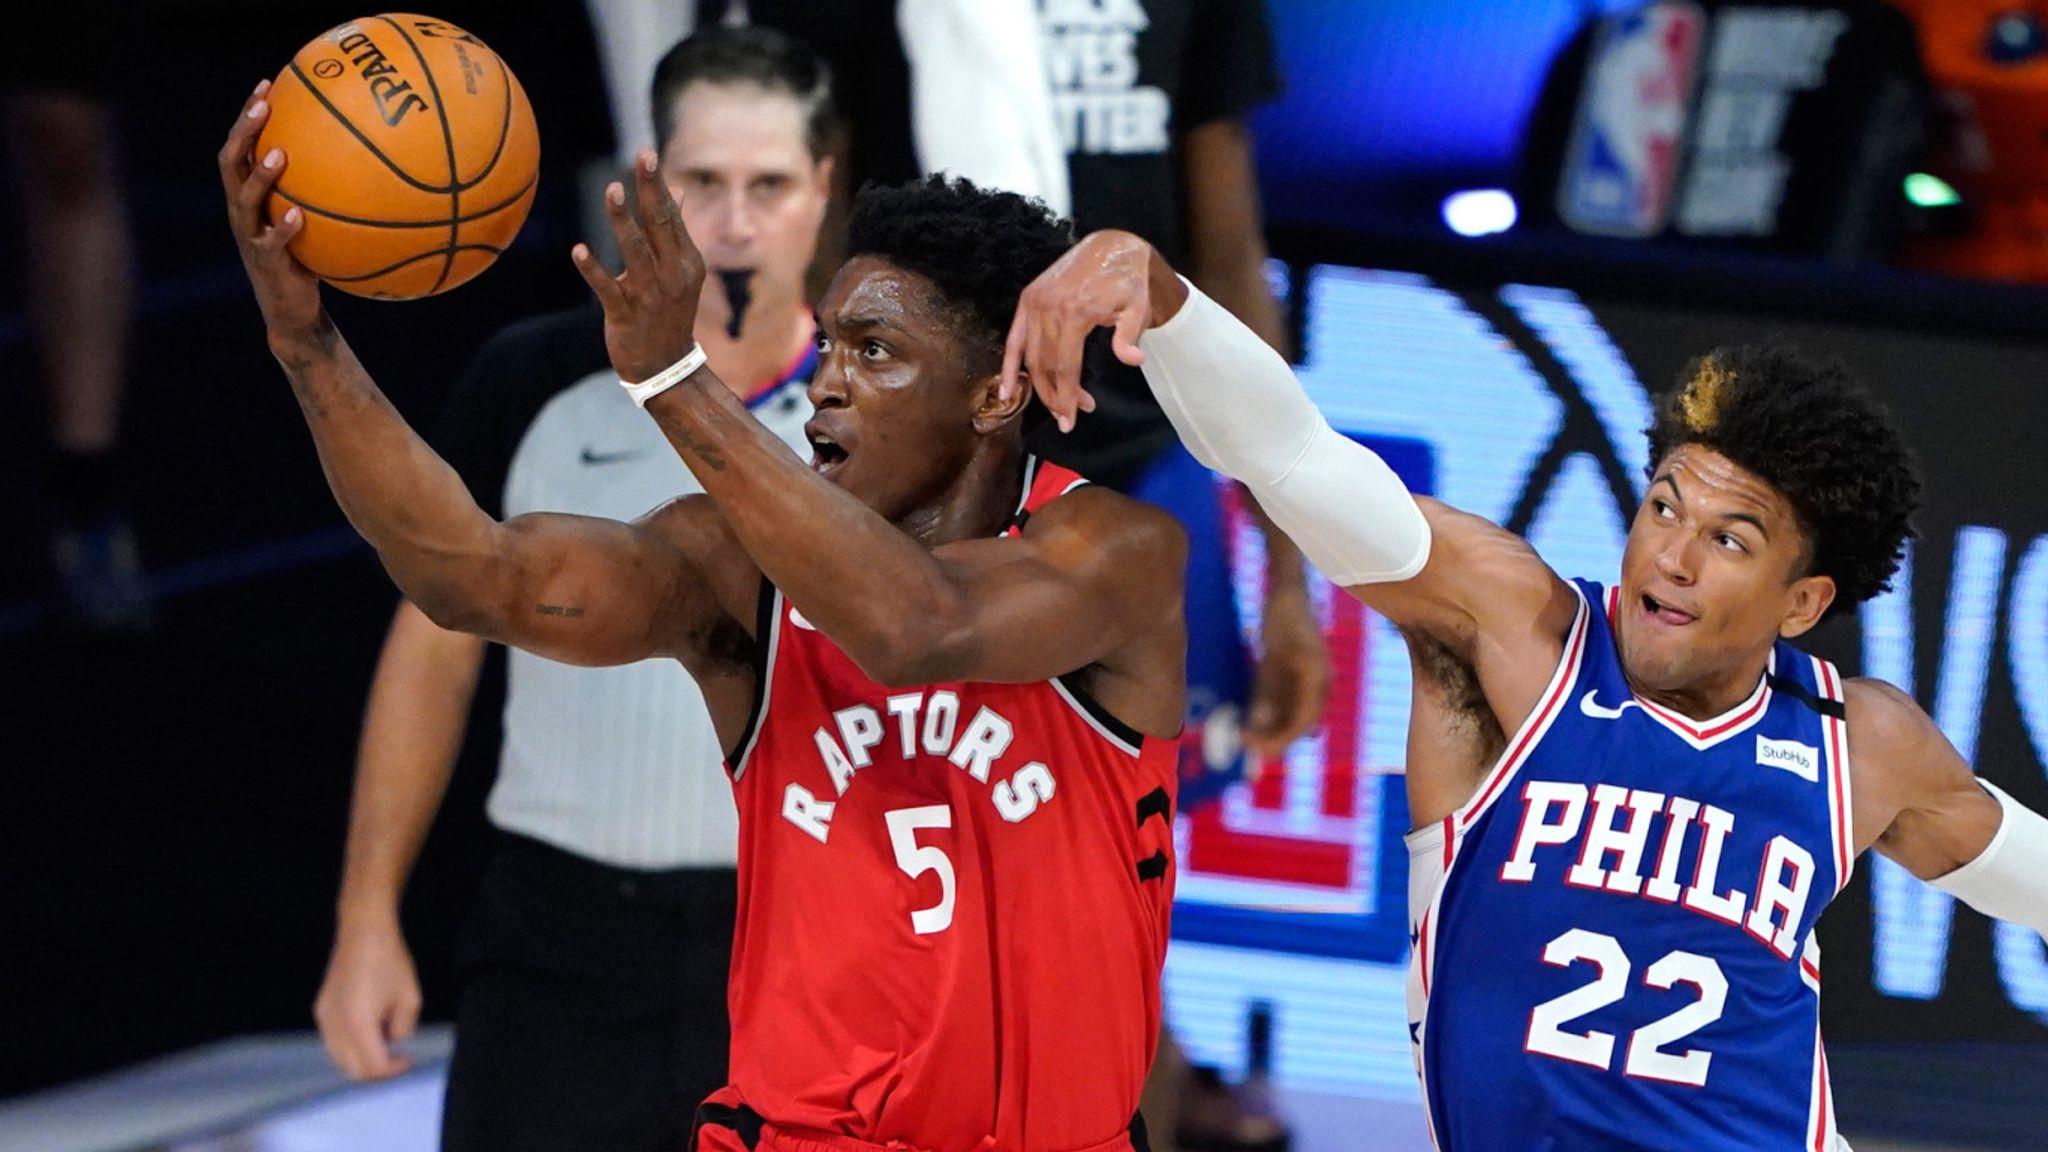 Stanley Johnson scores a vital basket for the Raptors